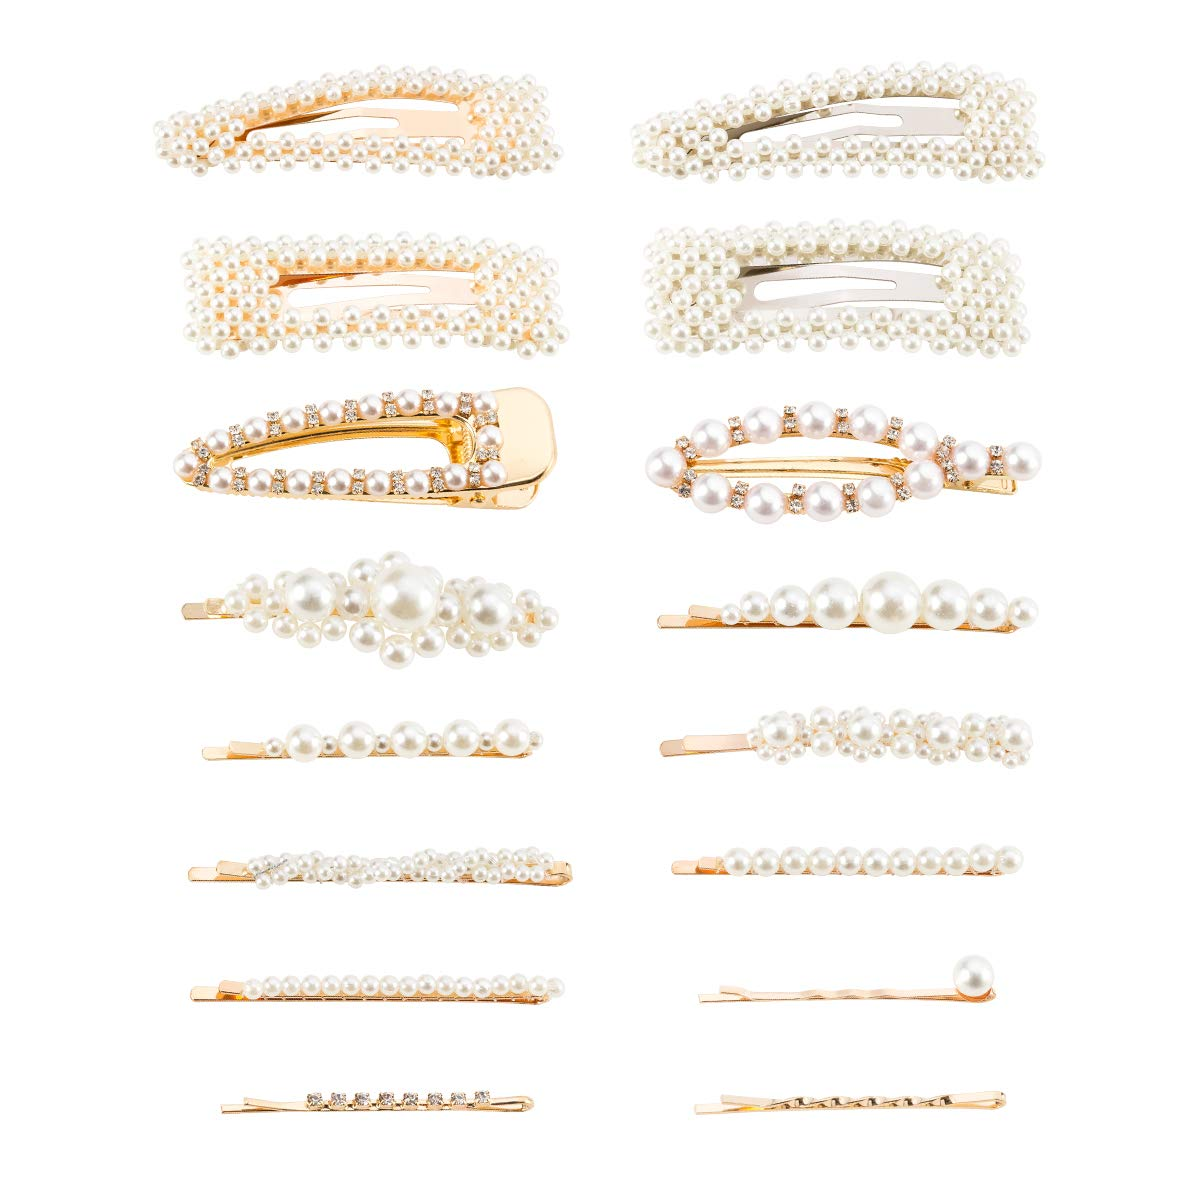 16 Pack Artificial Pearl Hair Pins Alloy Hair Barrettes Decorative Wedding Bridal Hair Clips Accessories for Women Girls Teens